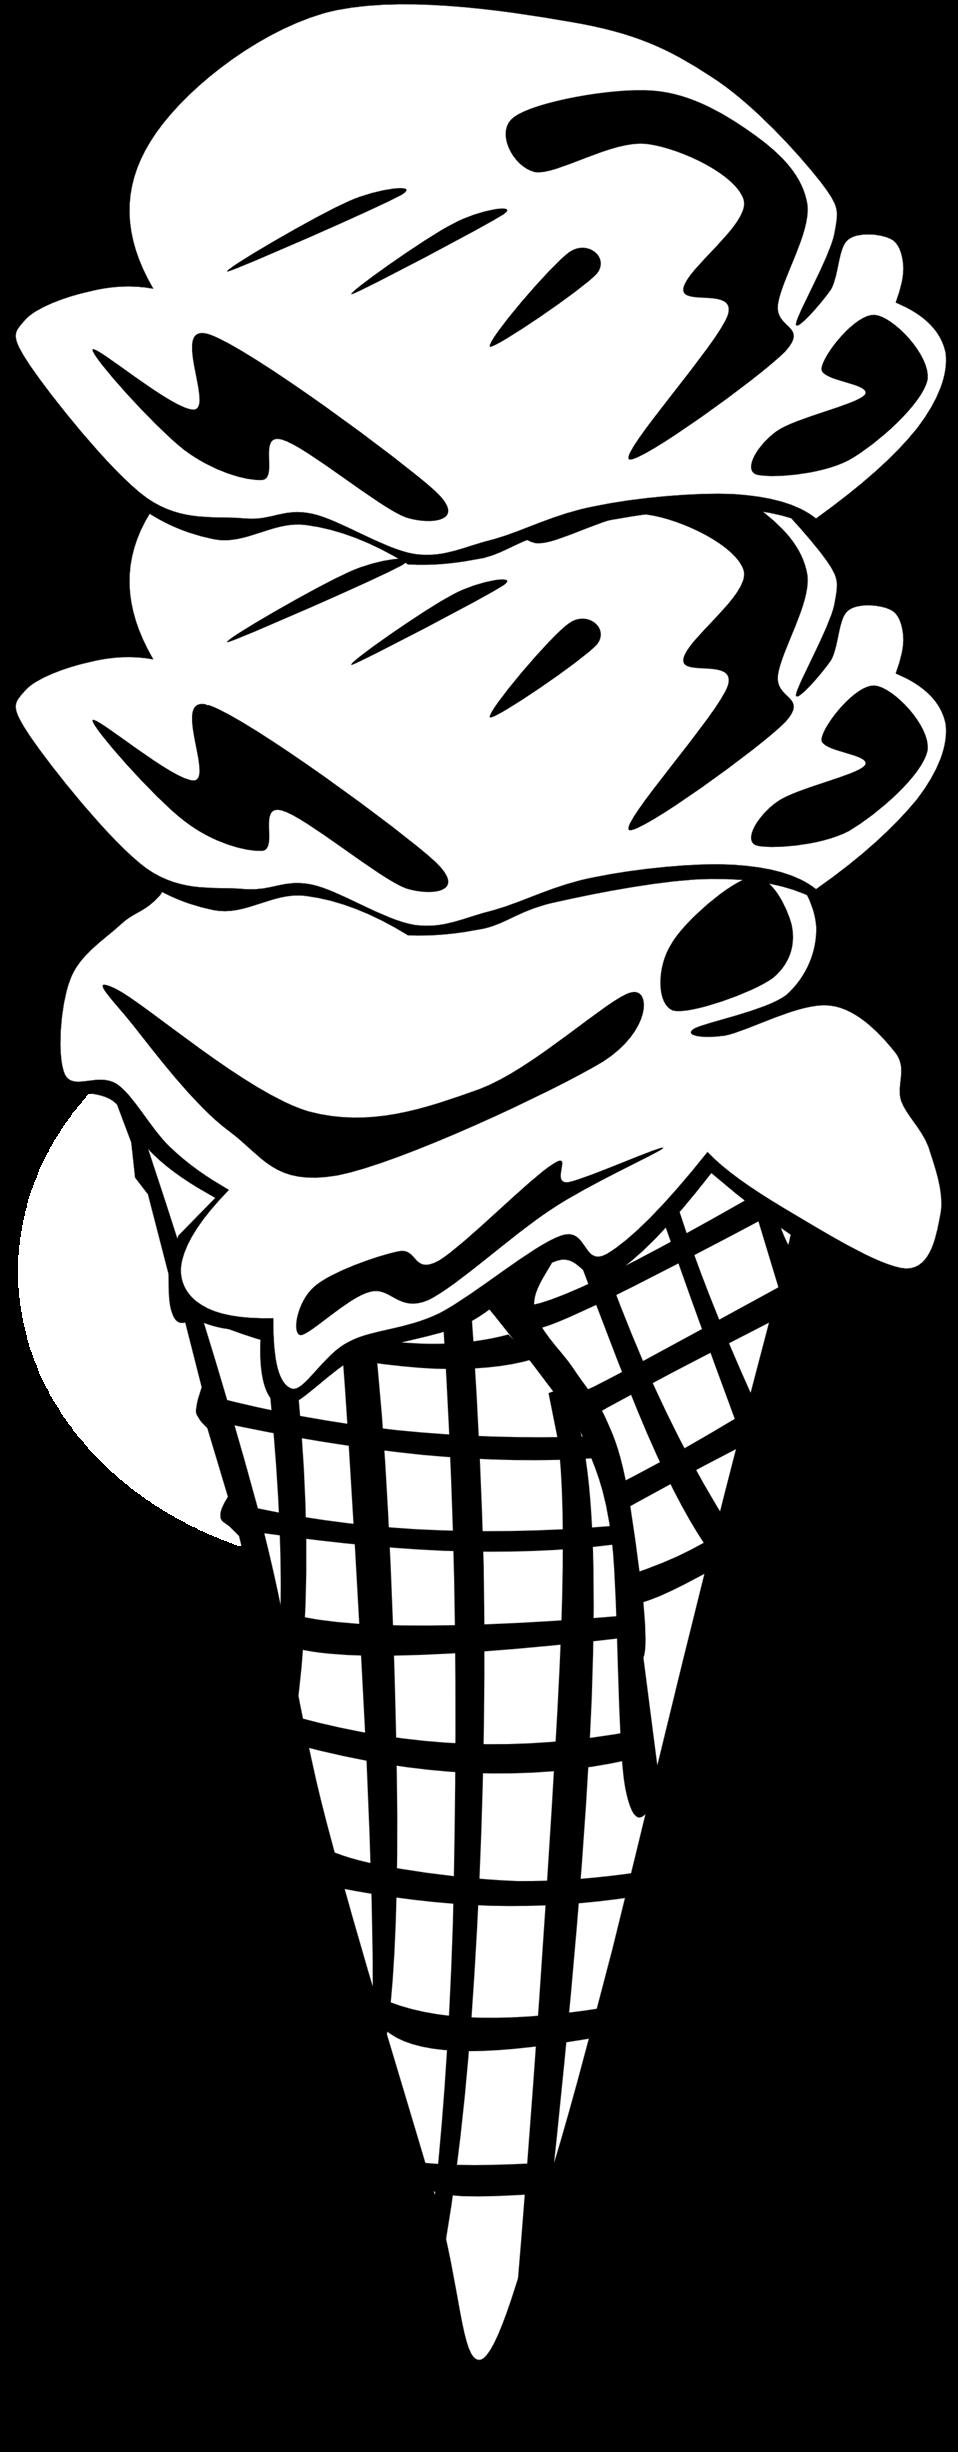 Panda free images waffleclipart. Waffle clipart waffle fry